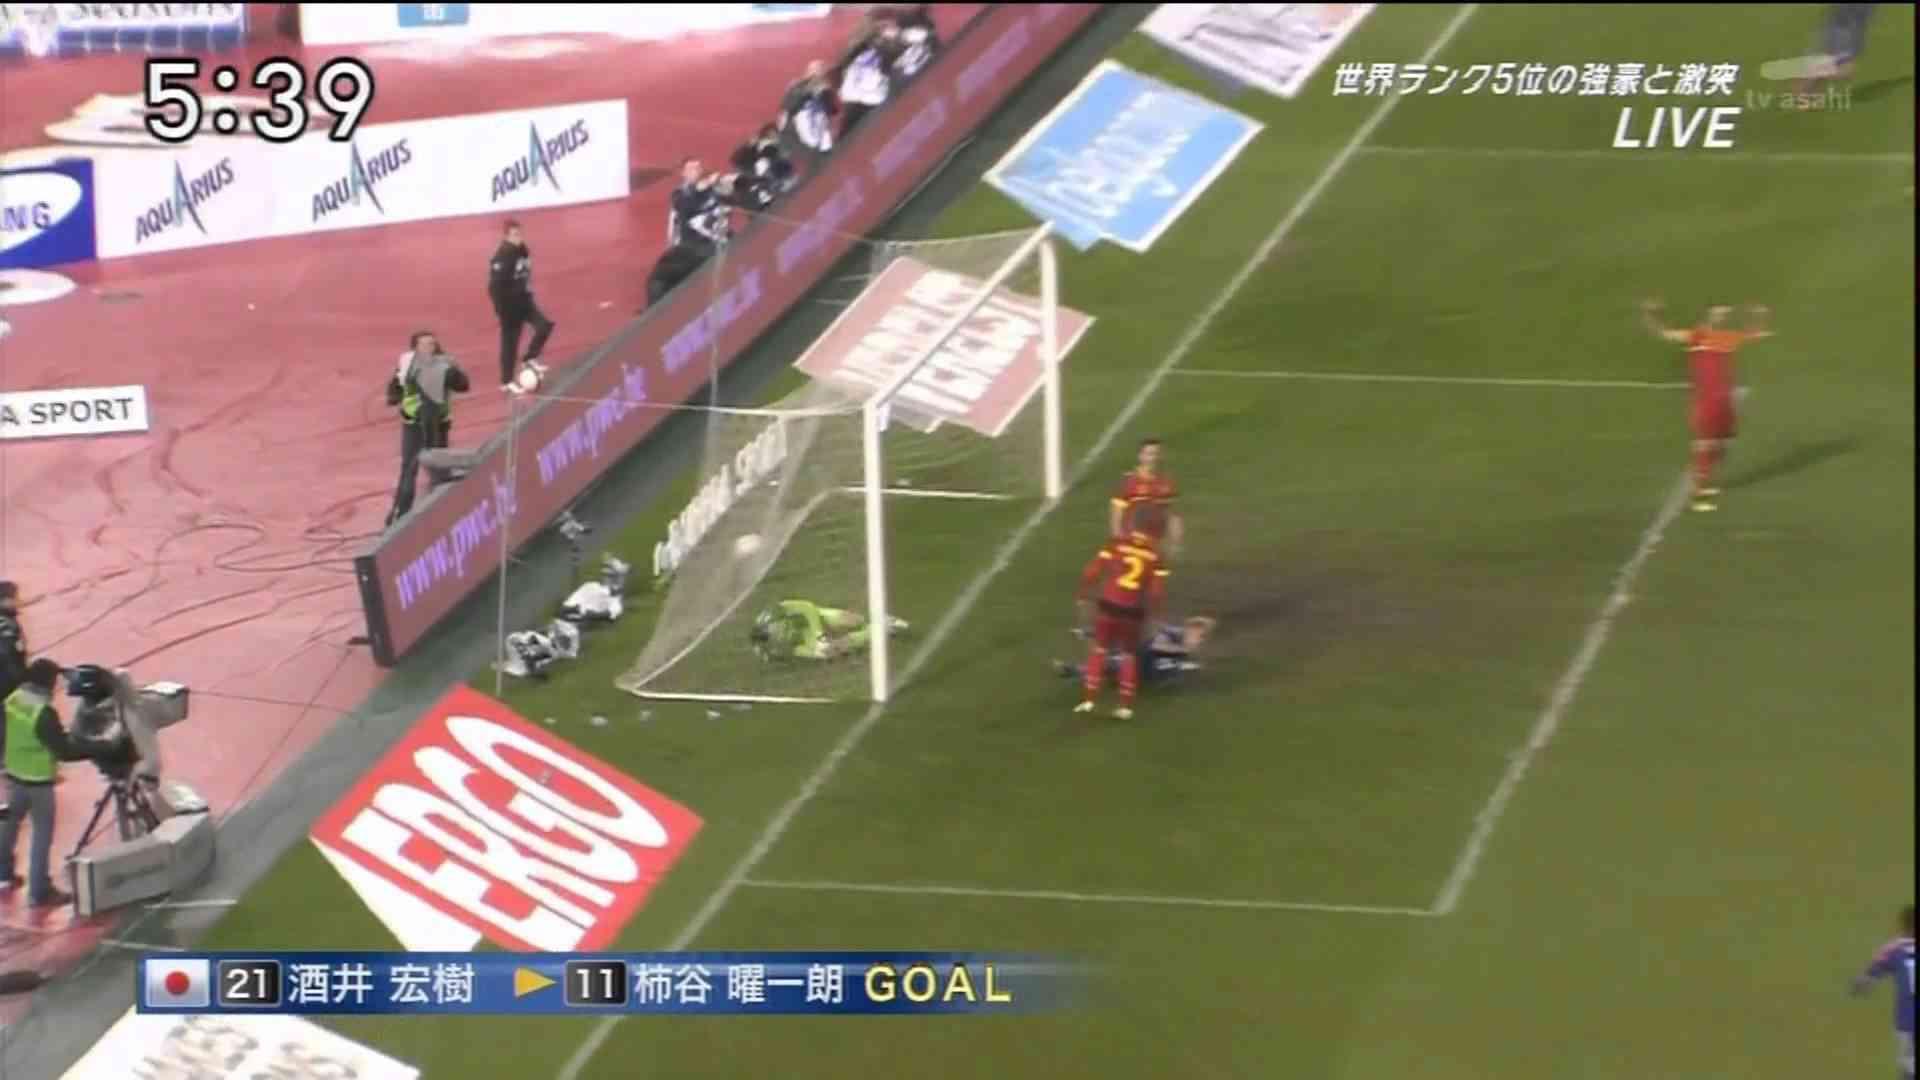 【HD】131120 Belgium 2-3 Japan | All Goals - YouTube